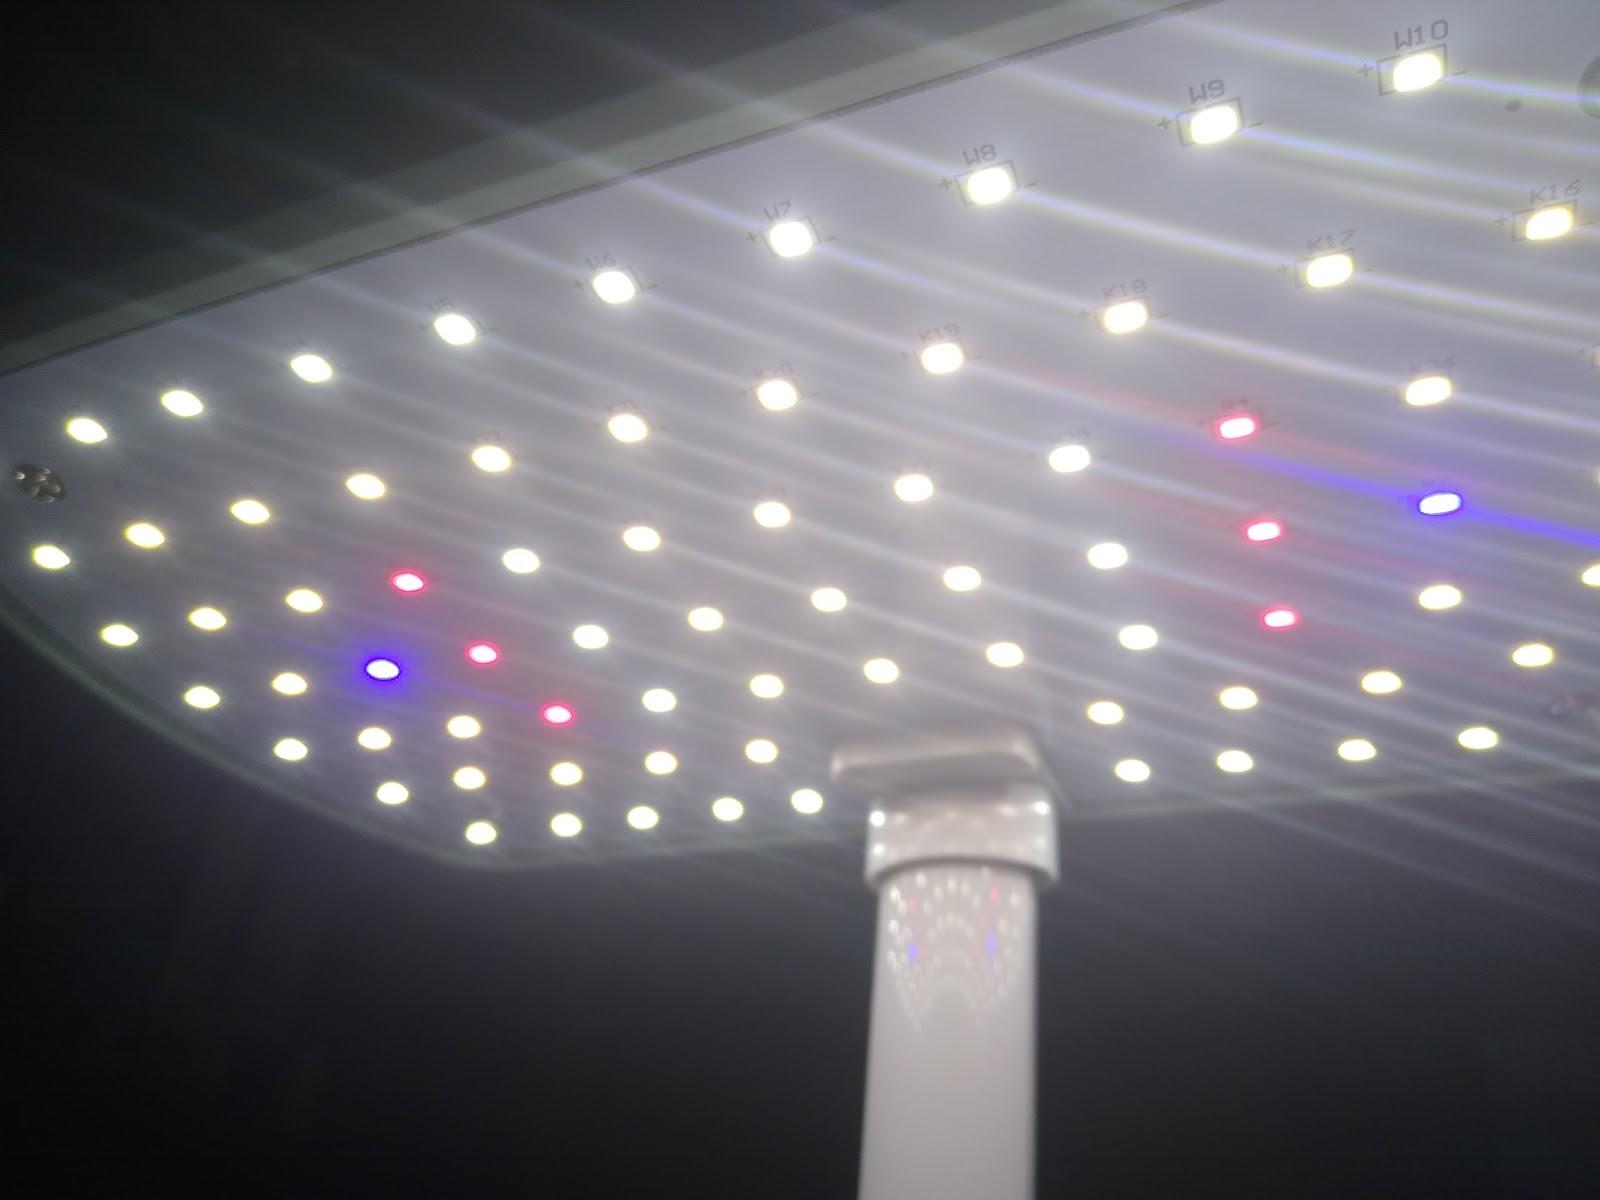 AeroGarden Harvest grow lights picture